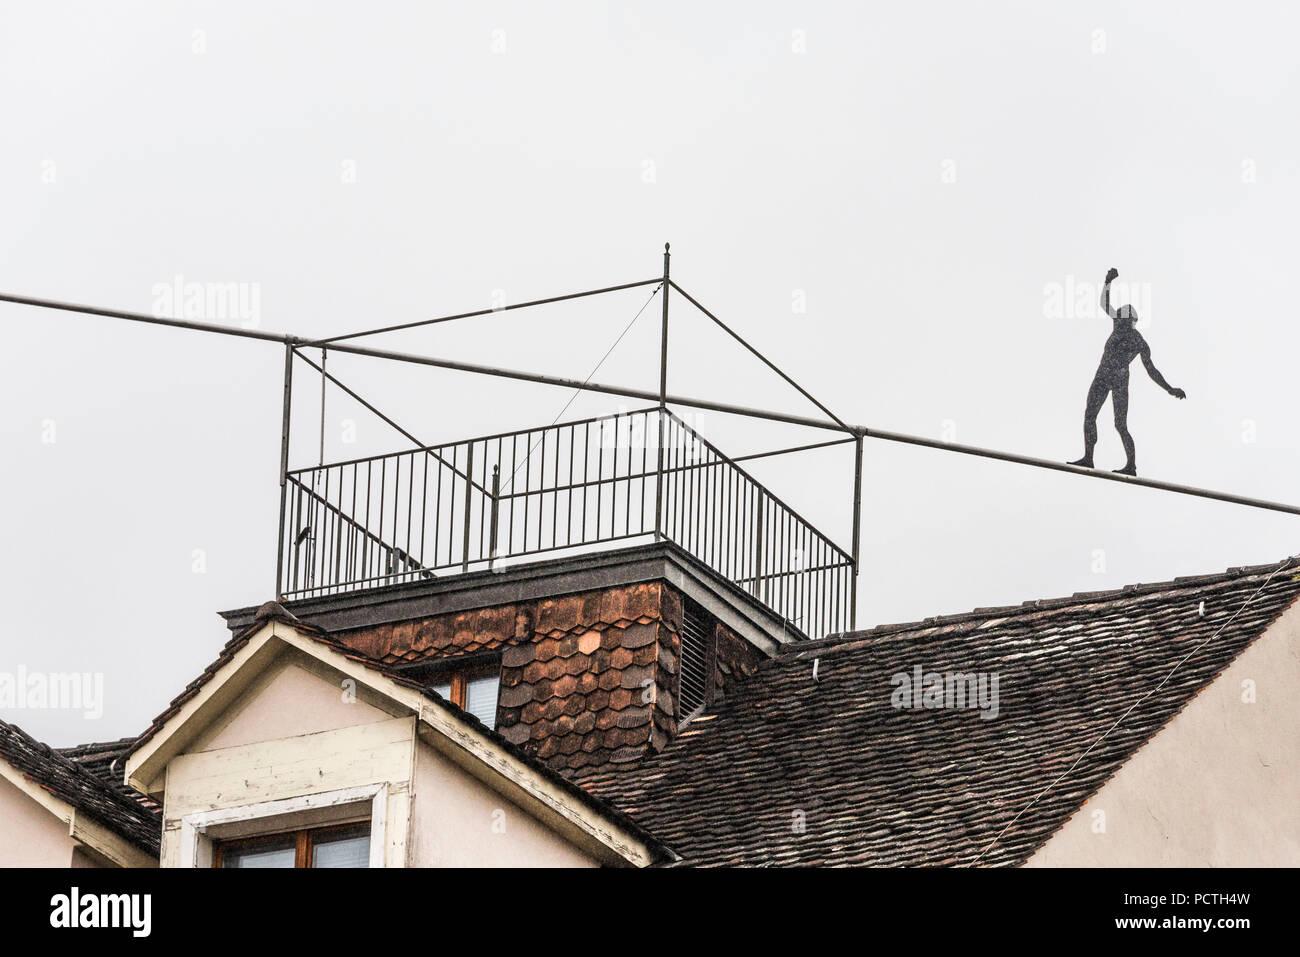 Tightrope walker above the city, Spalenberg, Basel, Canton Basel, Switzerland - Stock Image